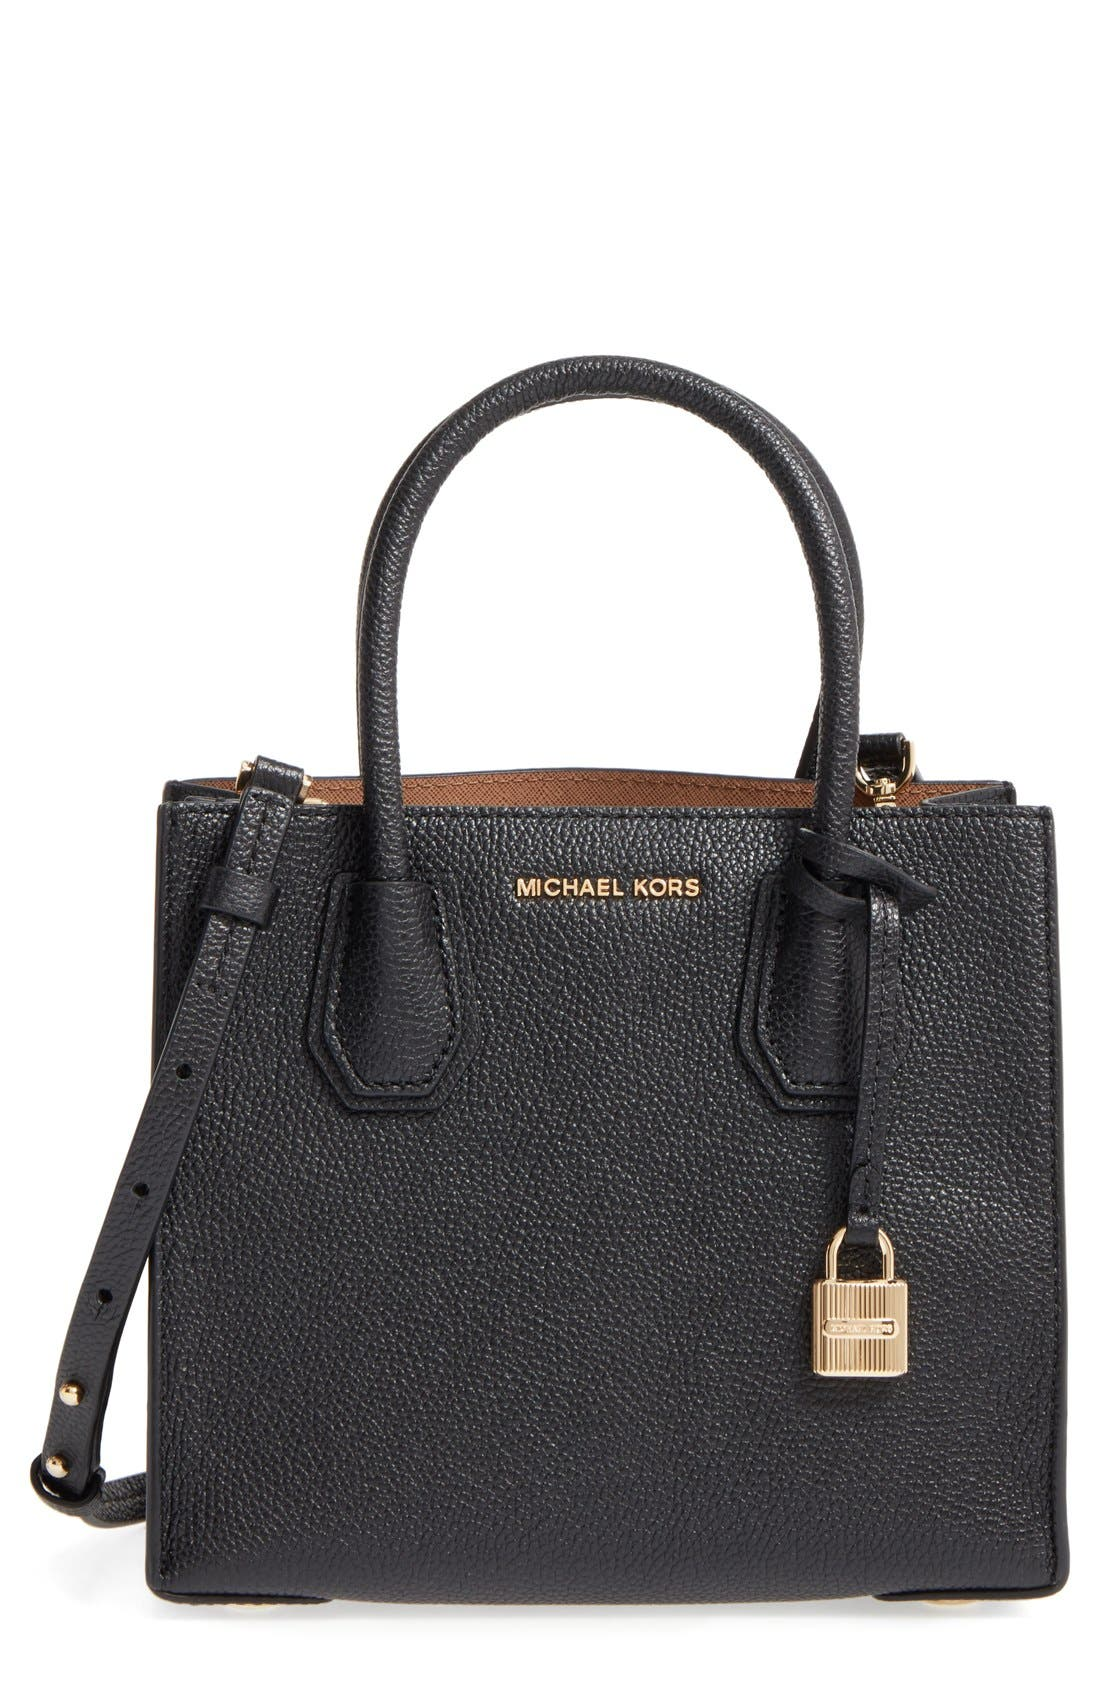 Mercer Leather Crossbody Bag,                         Main,                         color, Black/ Gold